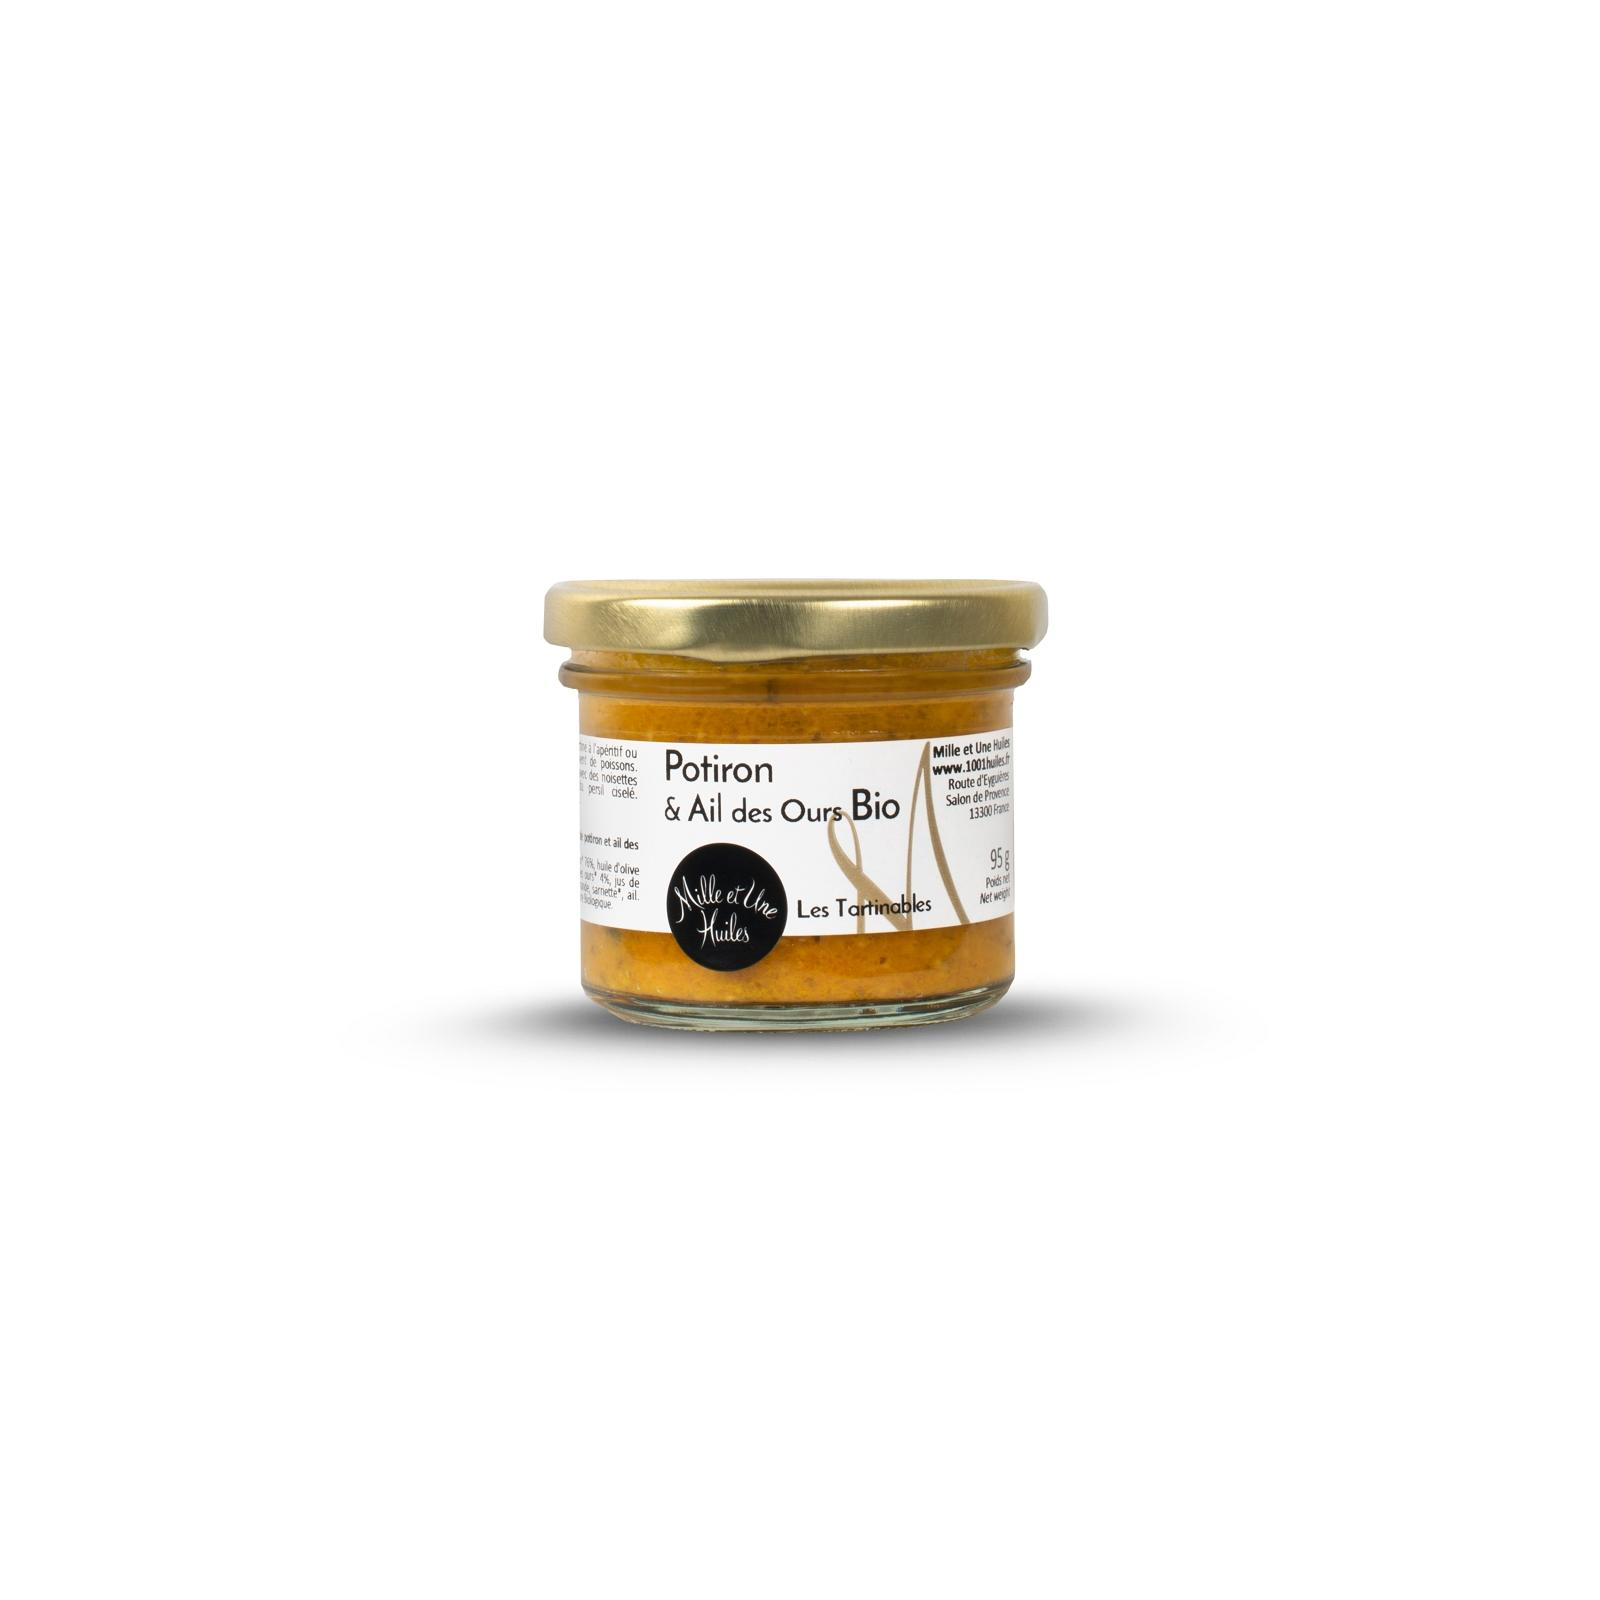 Tartinable potiron ail des ours